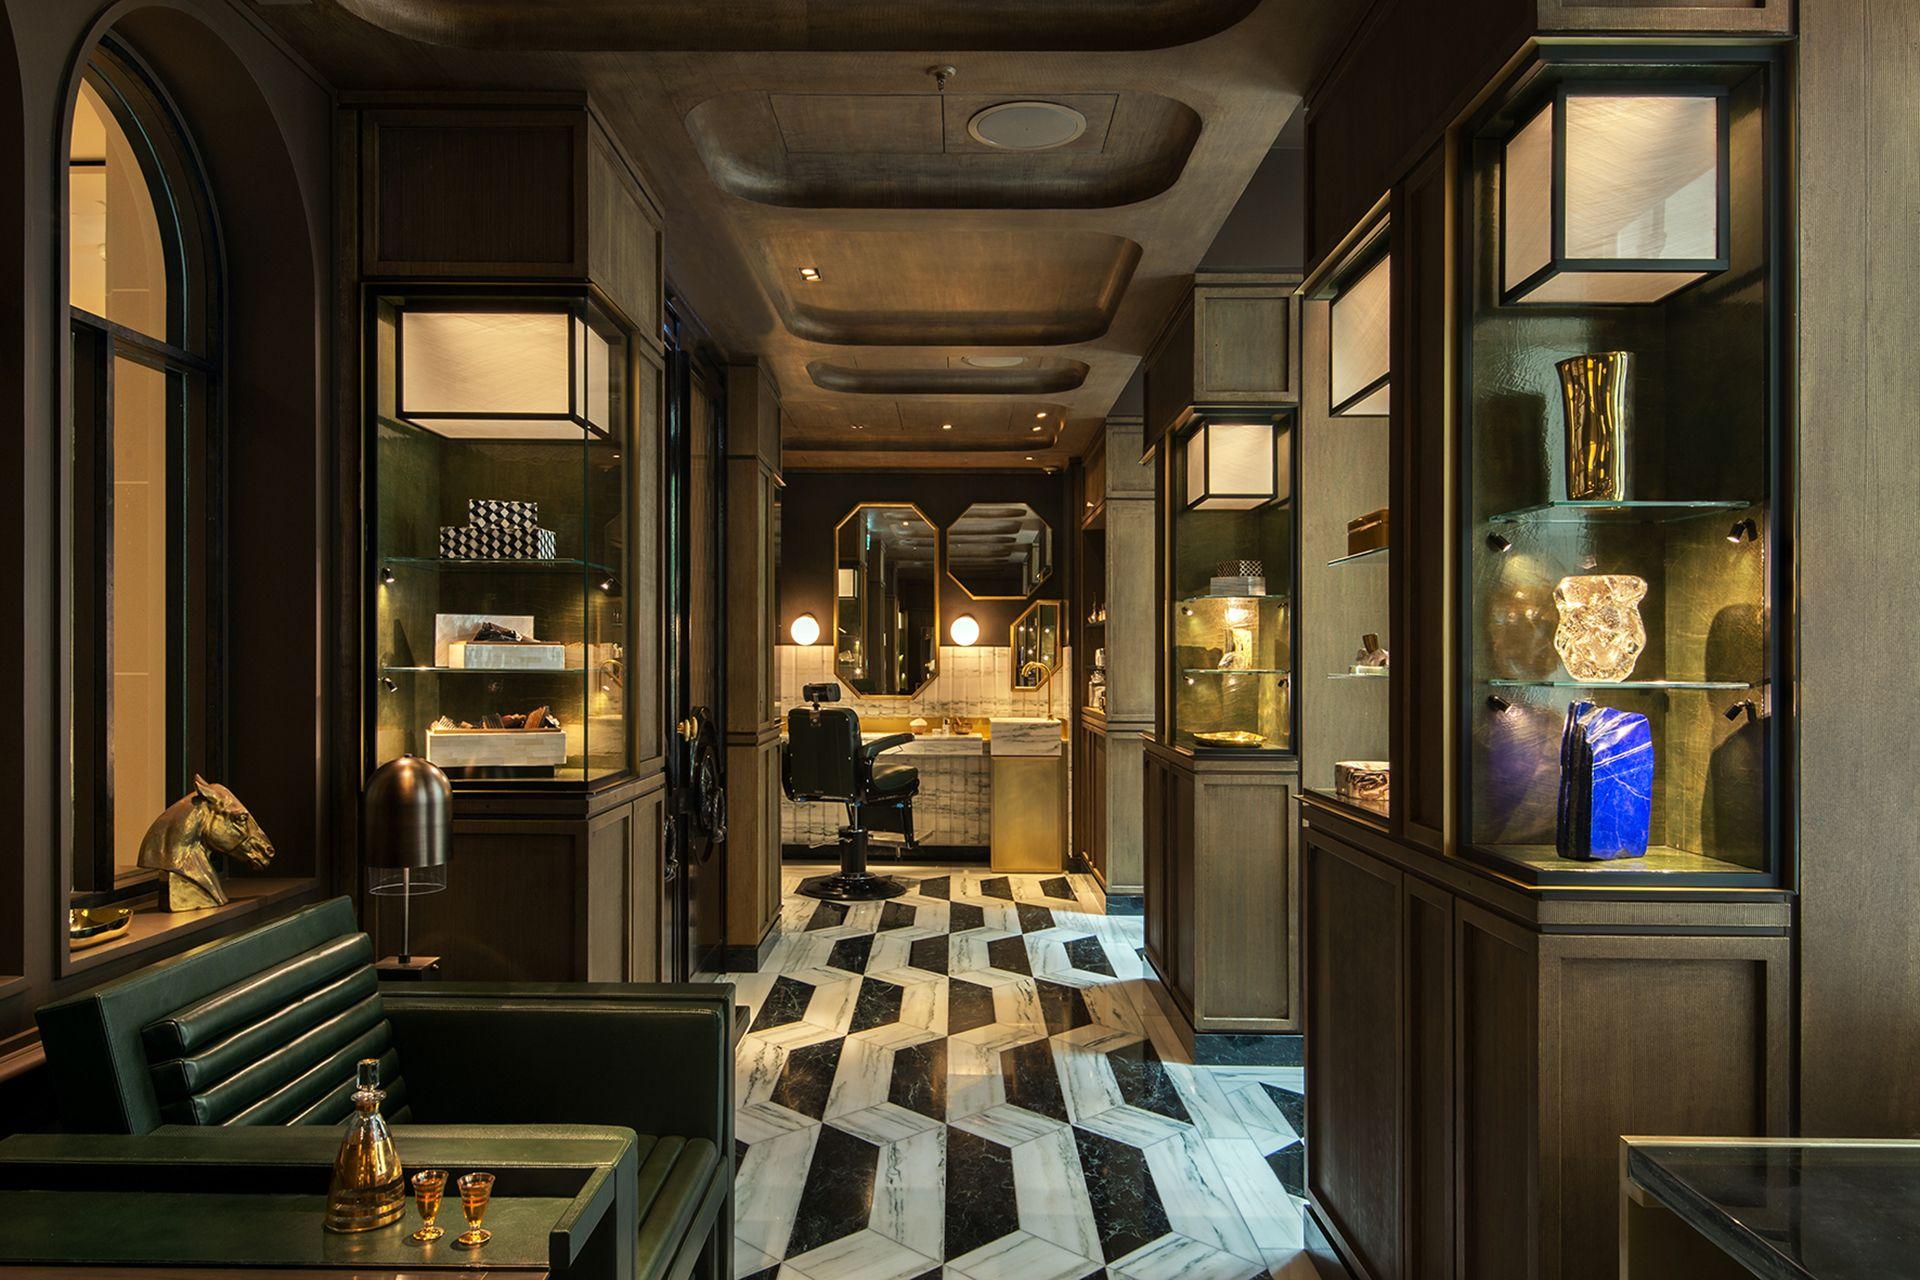 Tristan Auer - Maison & Objet Designer of the Year 2017 - Hotel de Crillon France tristan auer Tristan Auer: Maison & Objet 2017 Designer of the Year & Car Tailor 1 5